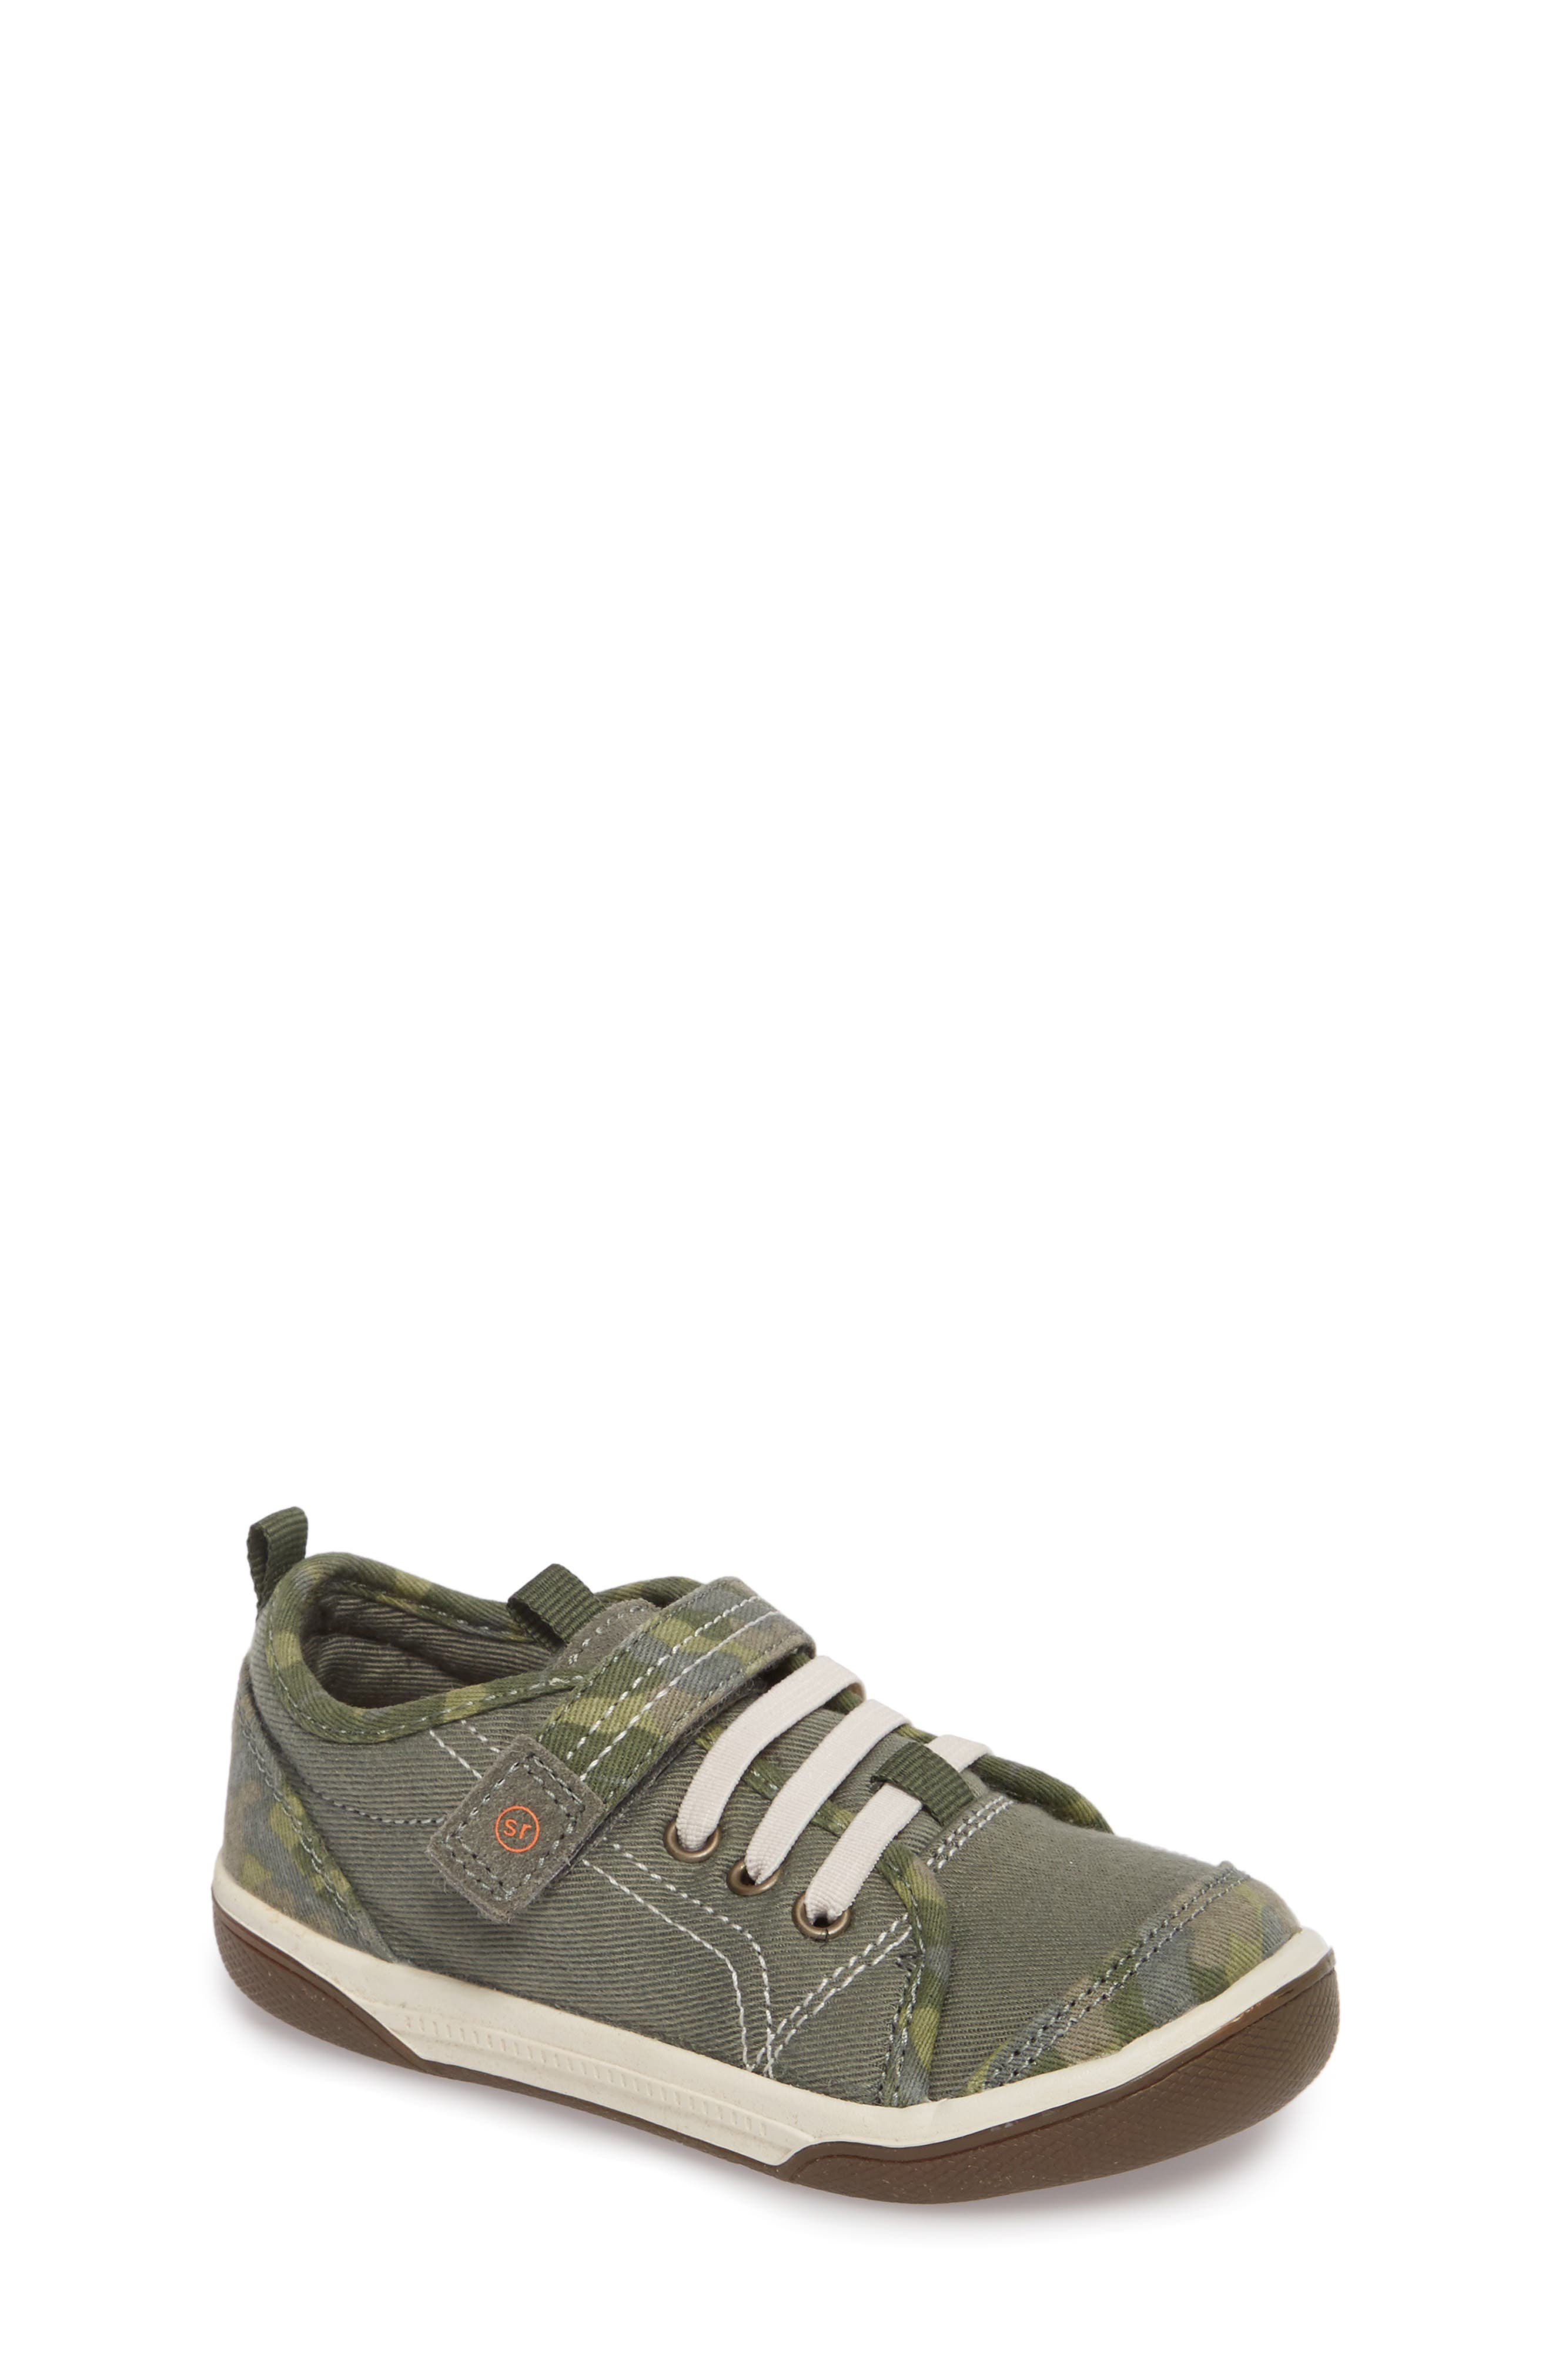 Alternate Image 1 Selected - Stride Rite Dakota Sneaker (Baby, Walker & Toddler)